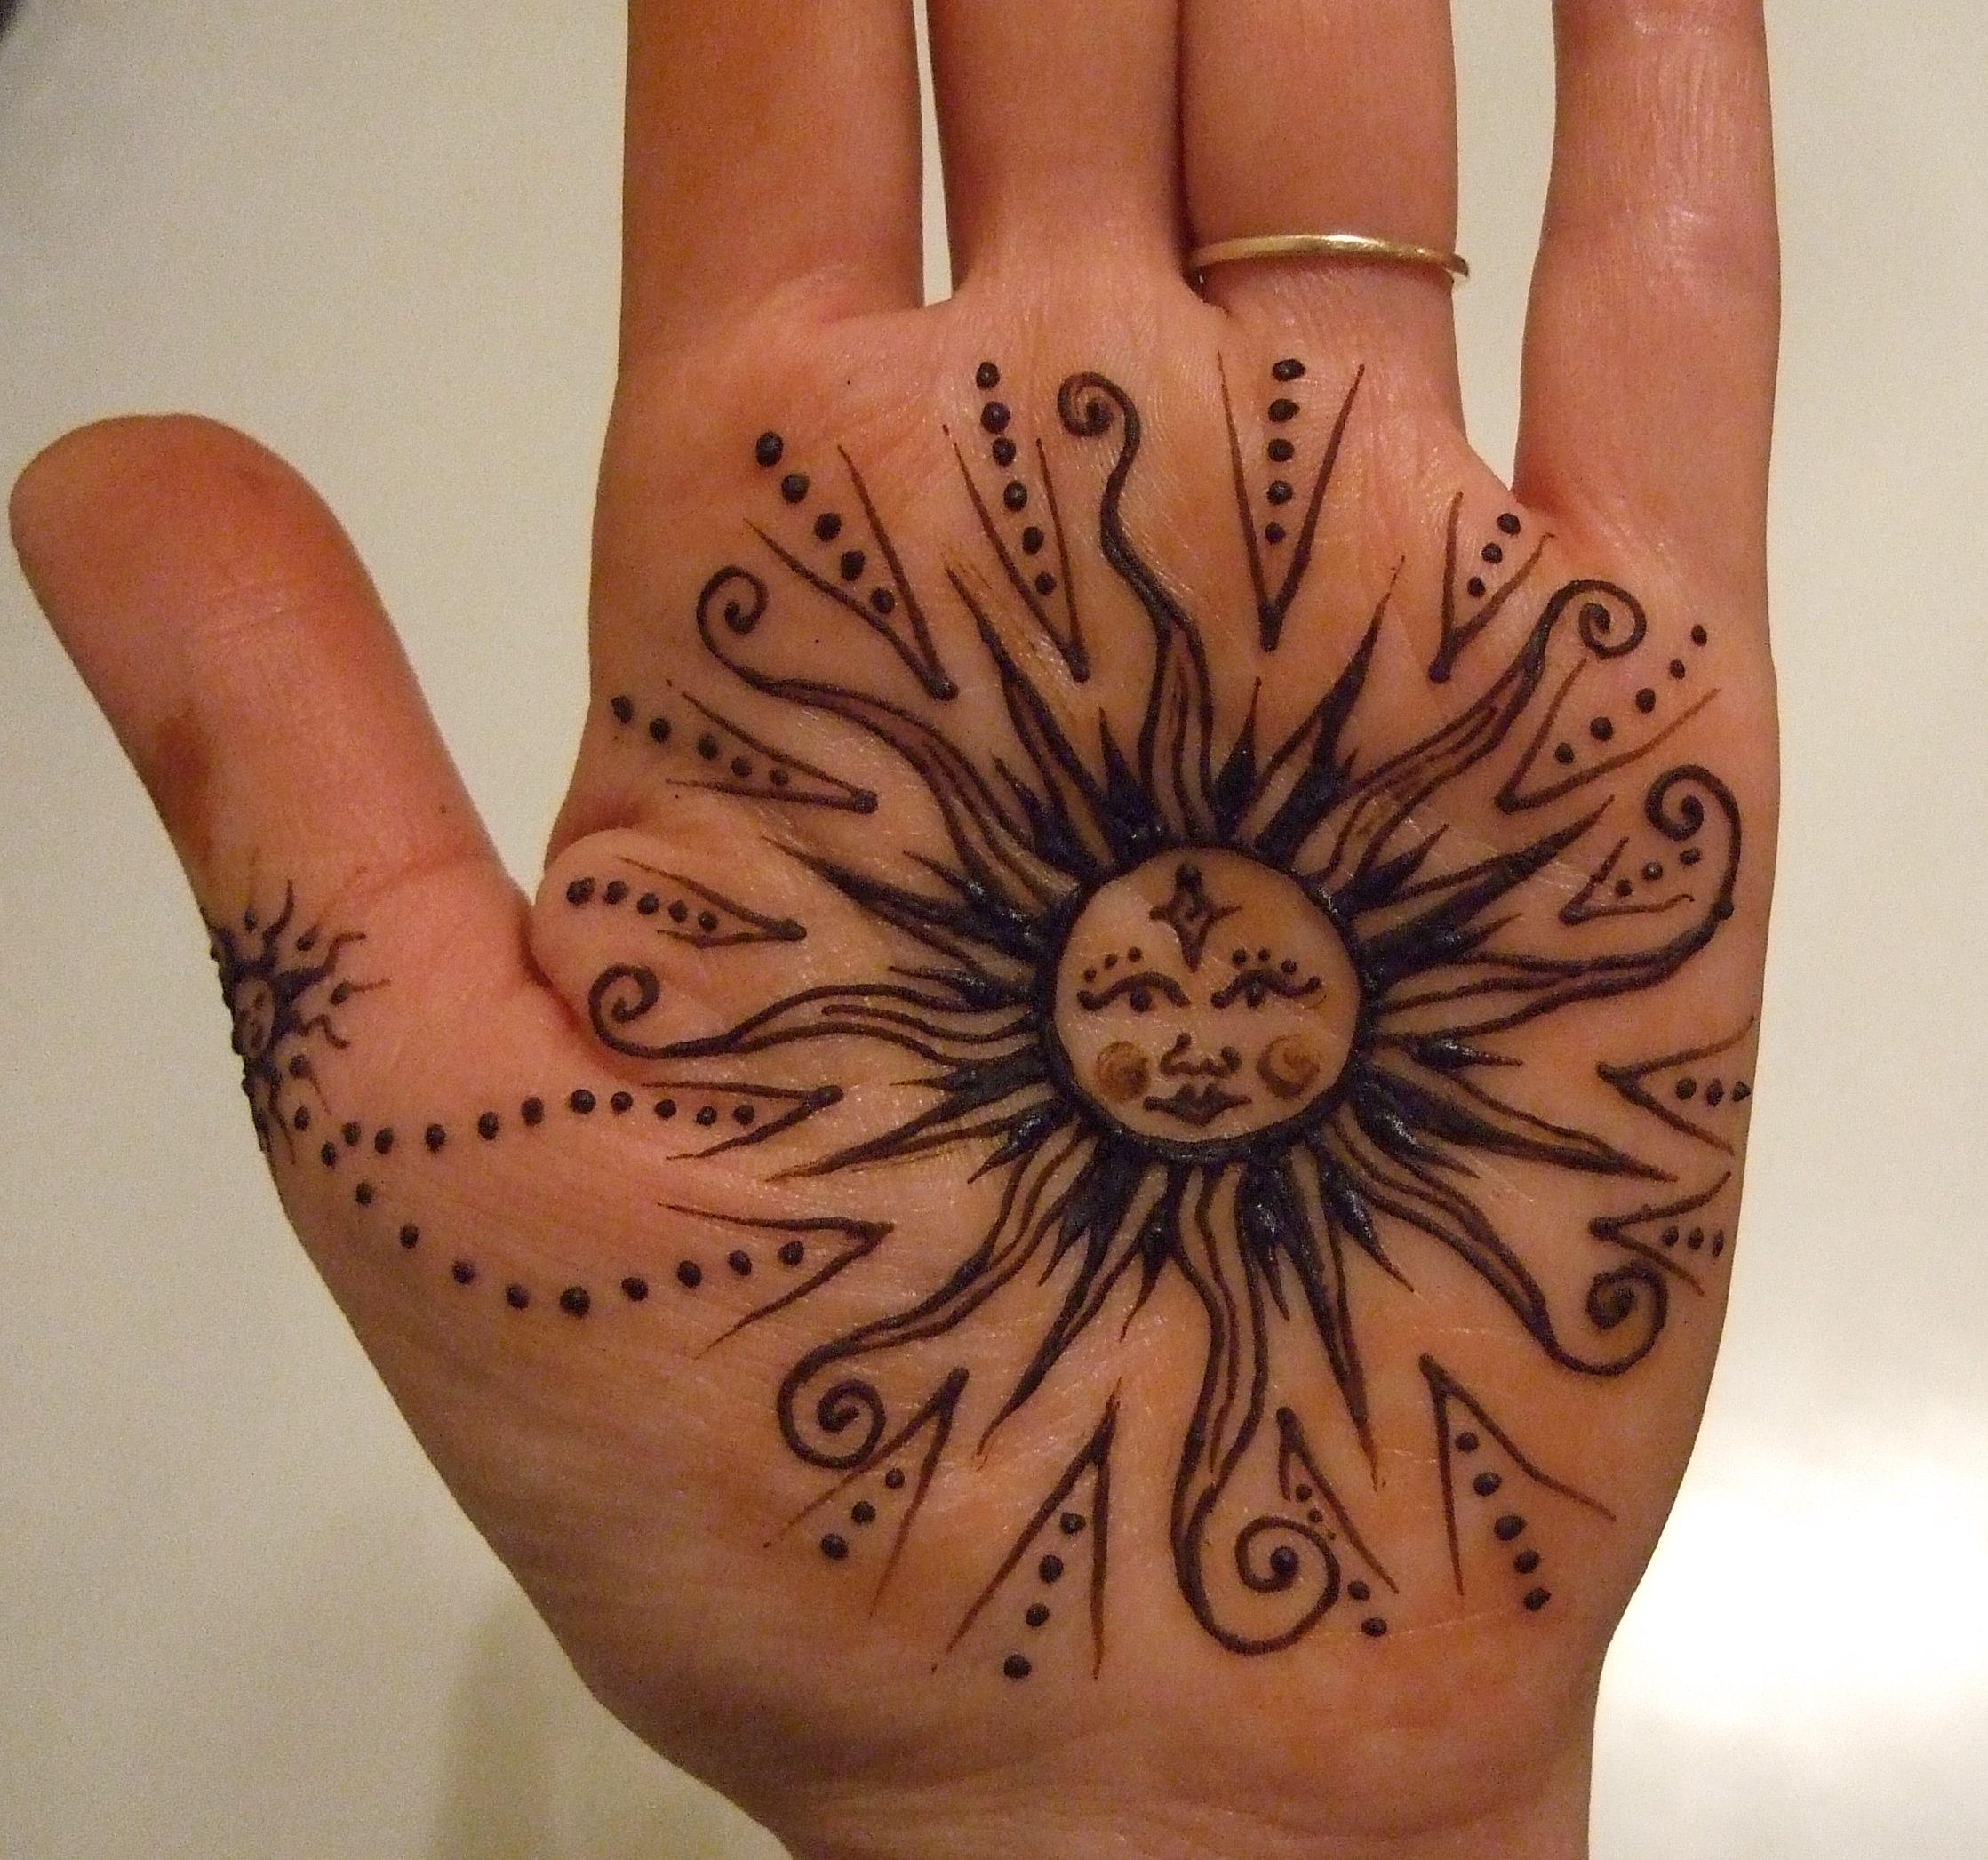 henna sun | Henna paste on the skin ... a little sun for ...